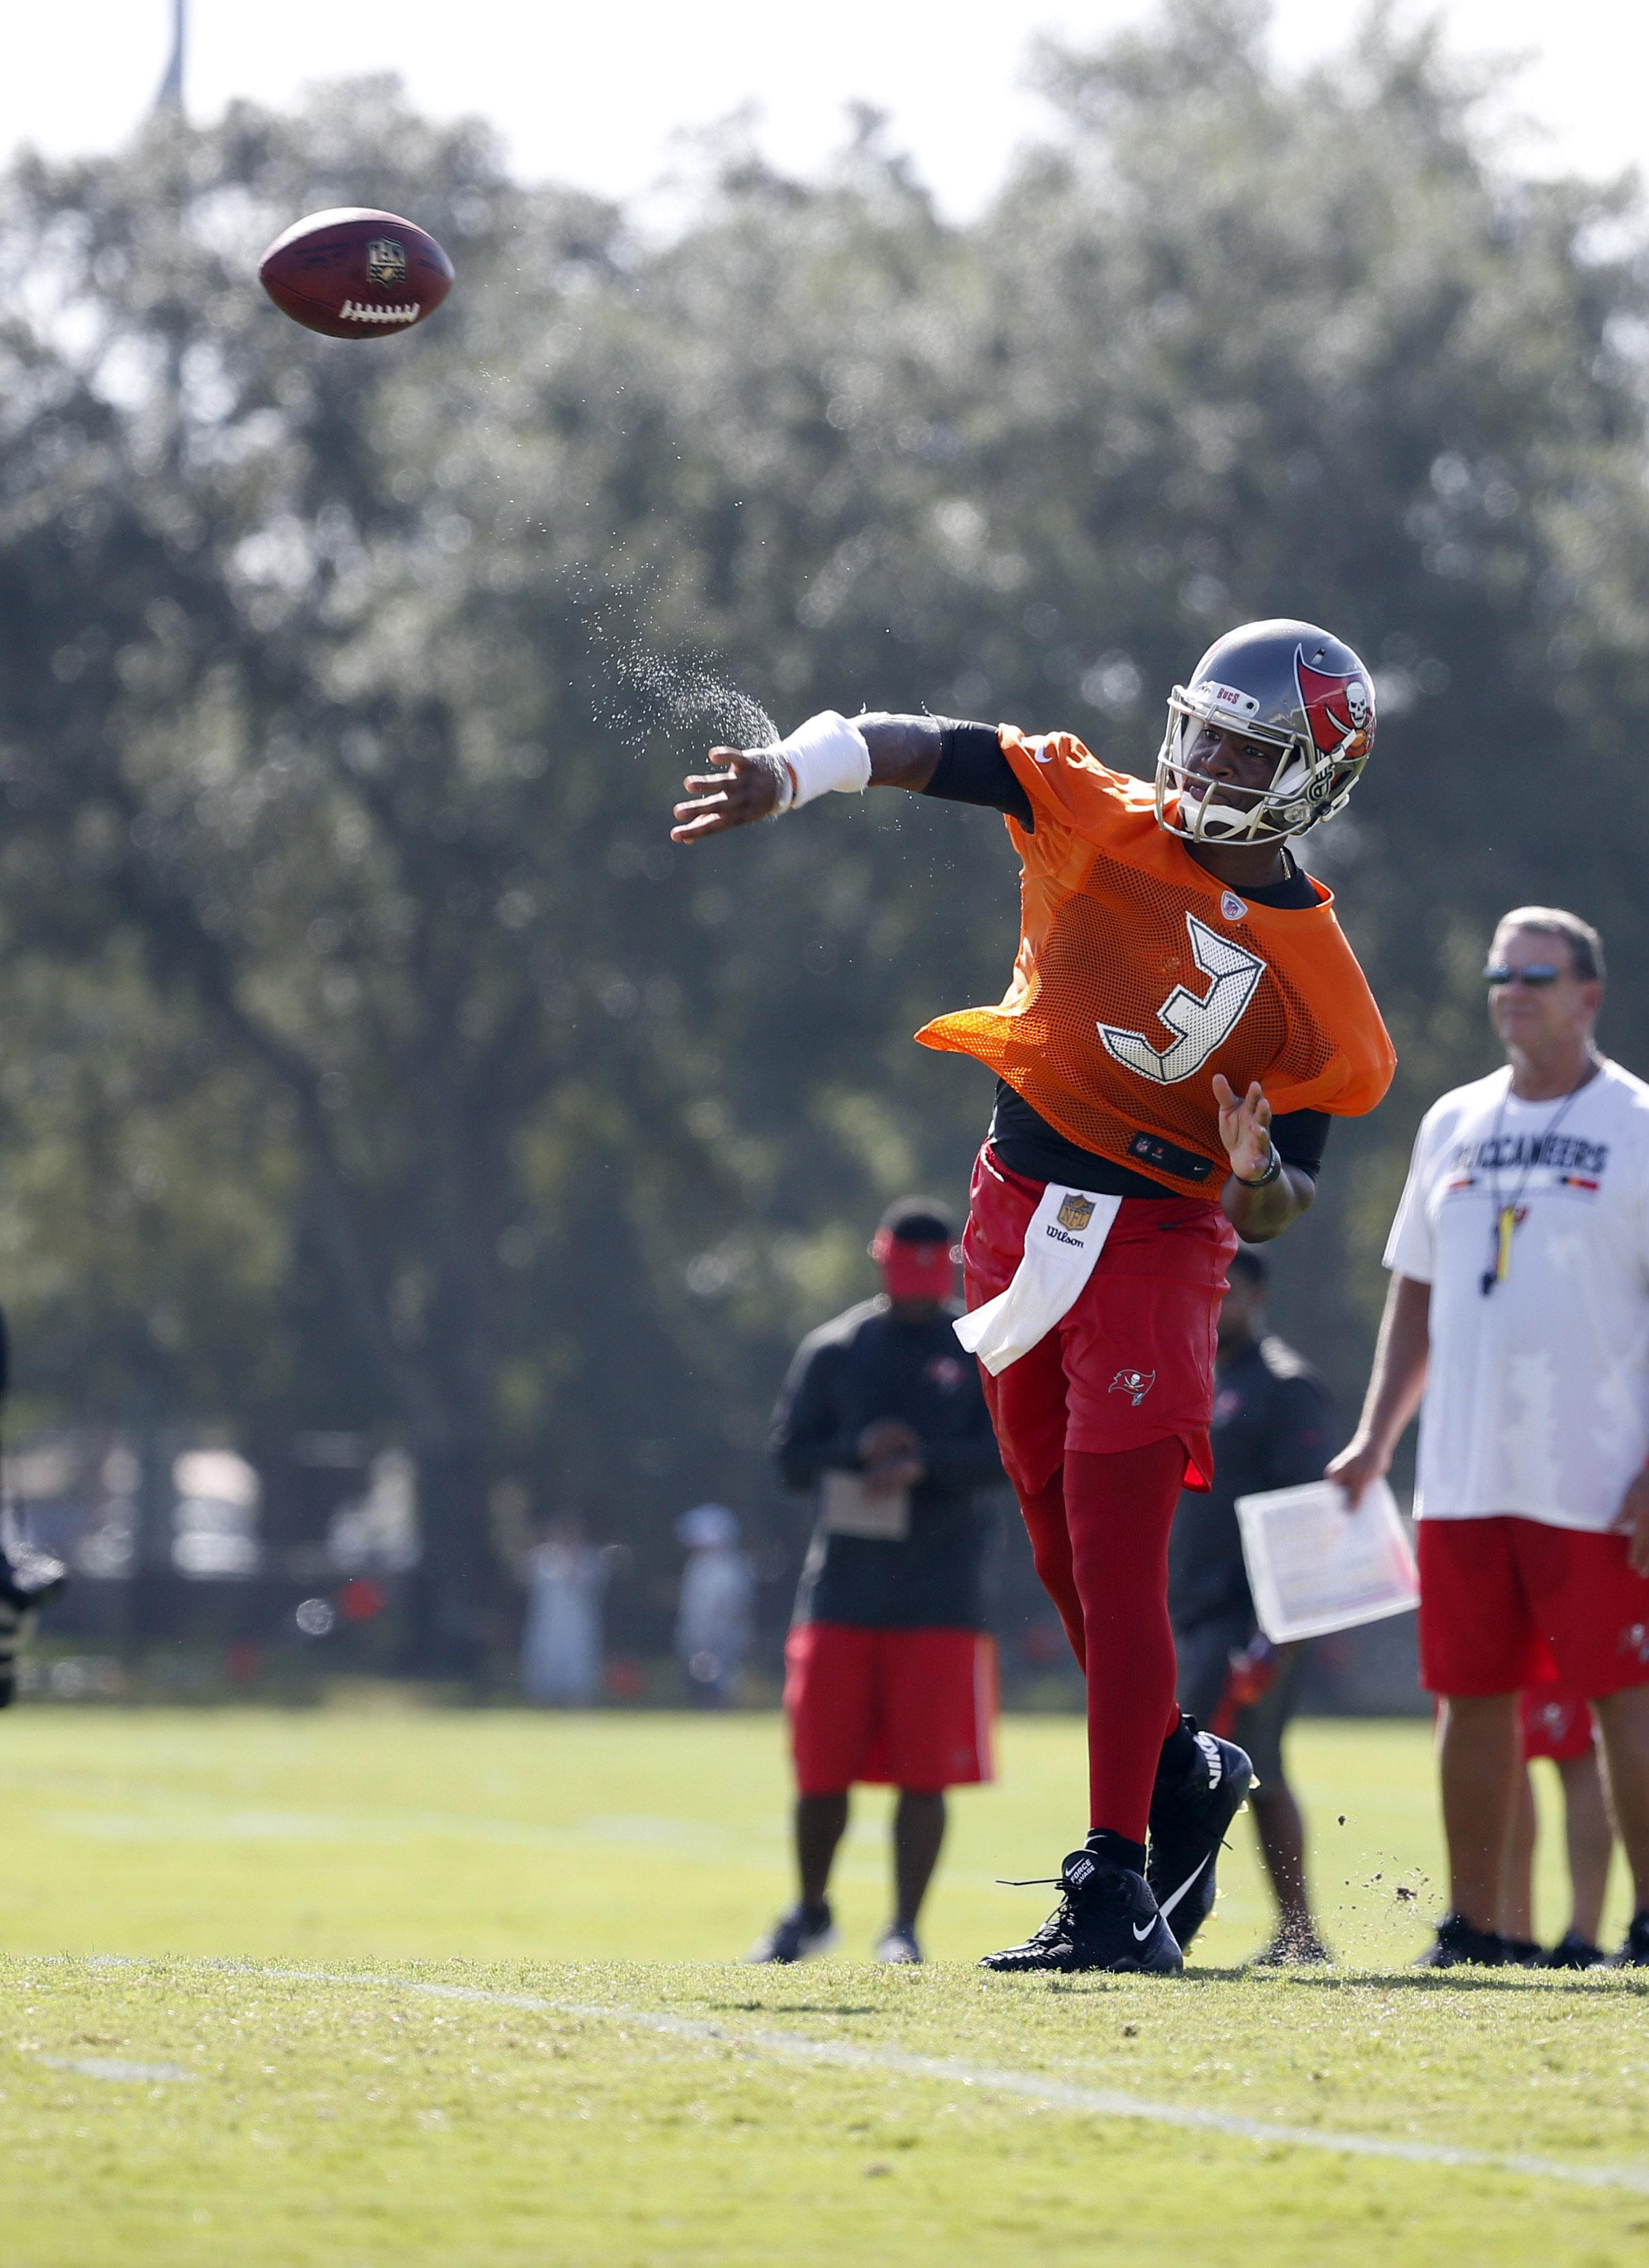 NFL: Tampa Bay Buccaneers-Training Camp